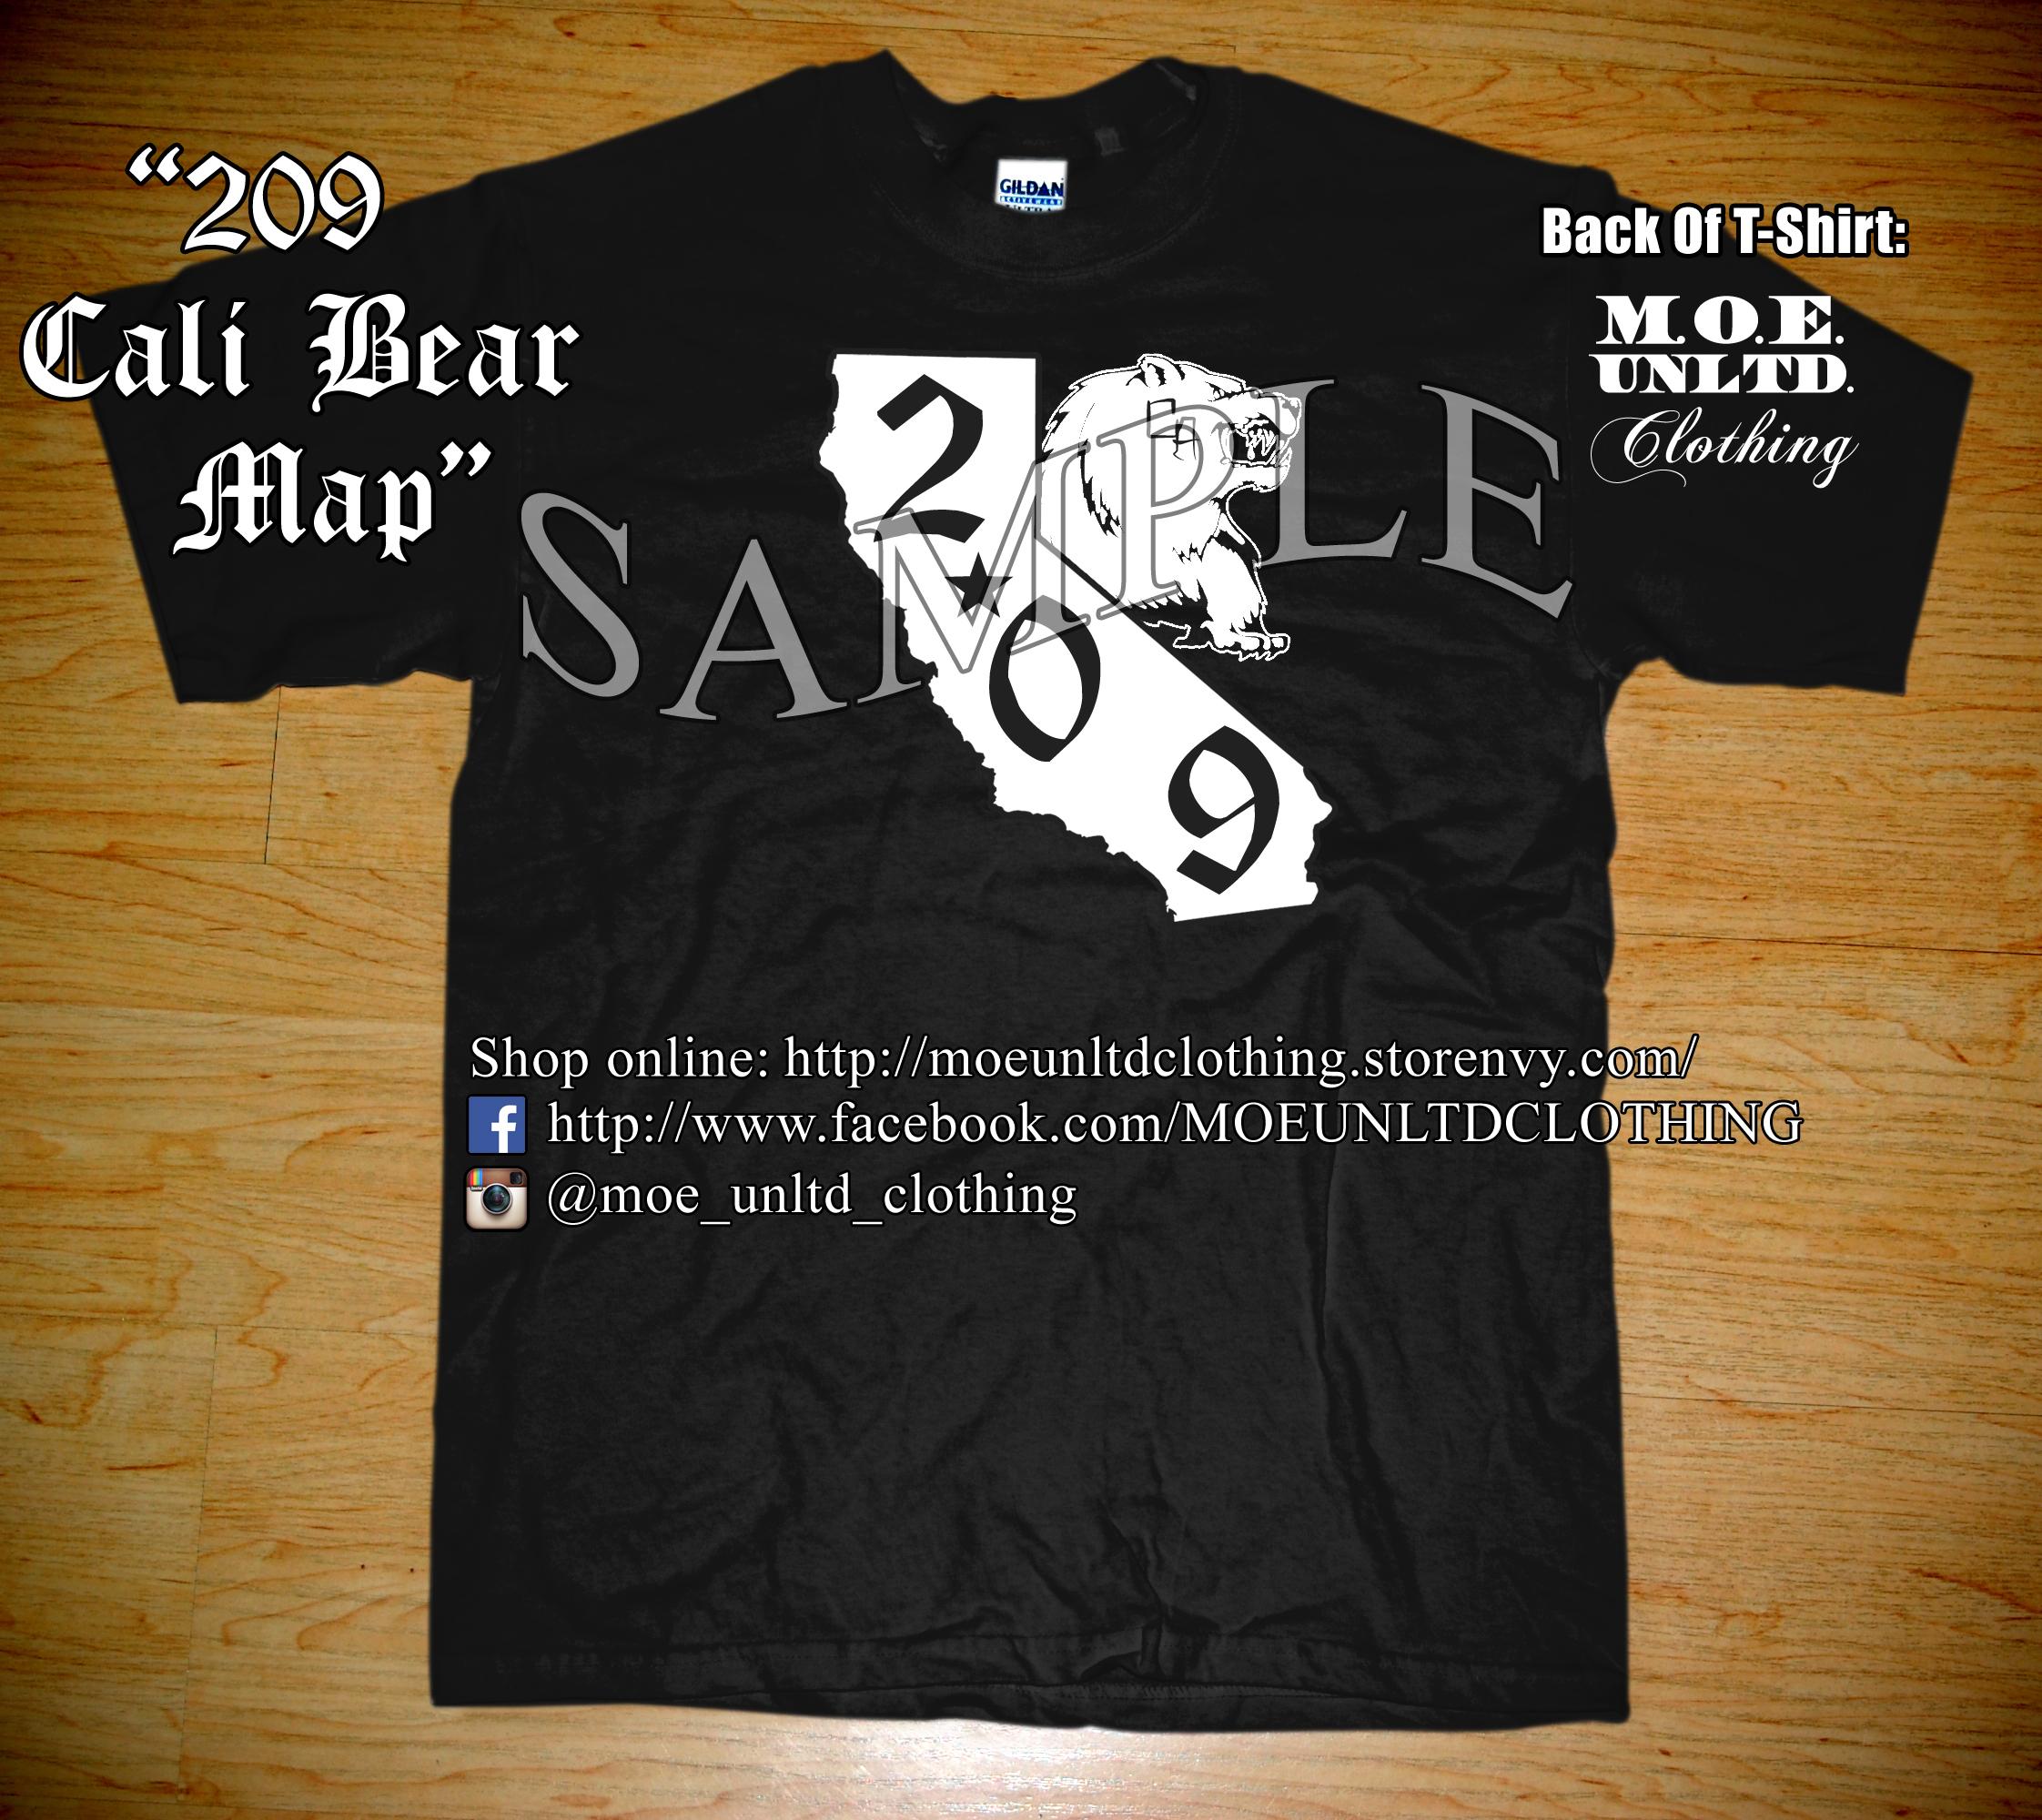 M.o.e. Unltd. Clothing | 209 Cali Bear Map Men's T-Shirt | Online - California Map Shirt